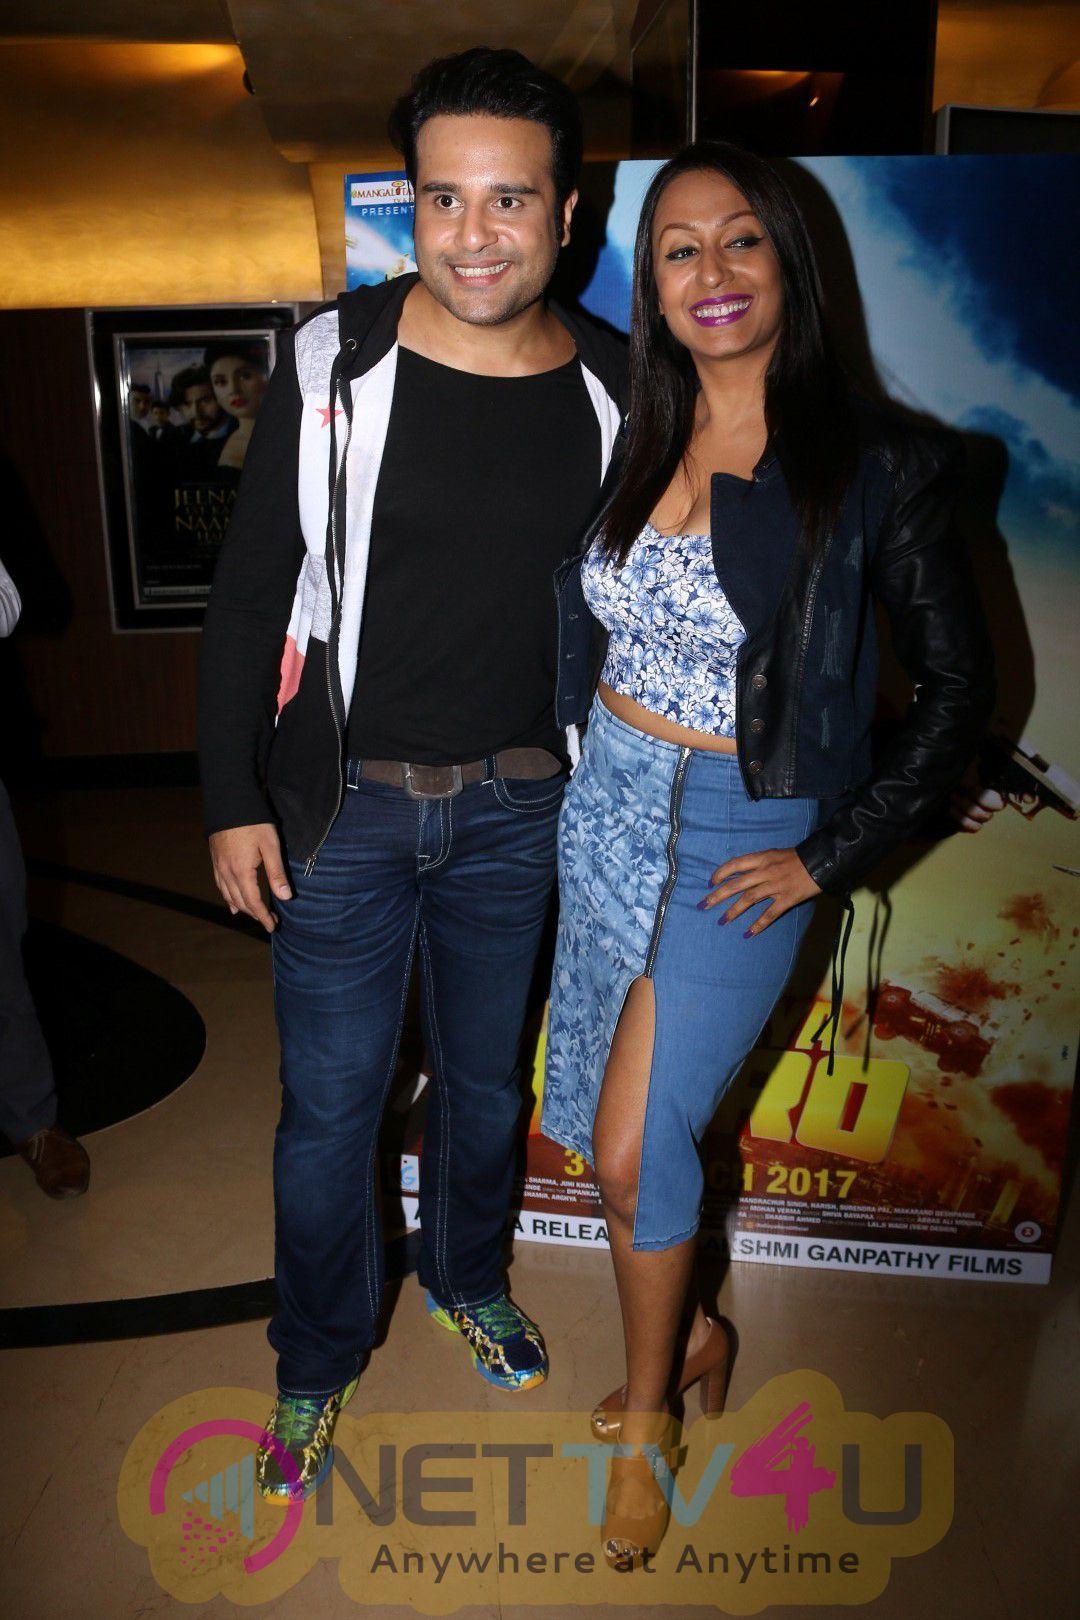 Launch Trailer Of Film Aagaya Hero With Govinda Shilpa Shetty & Manisha Koirala Photos